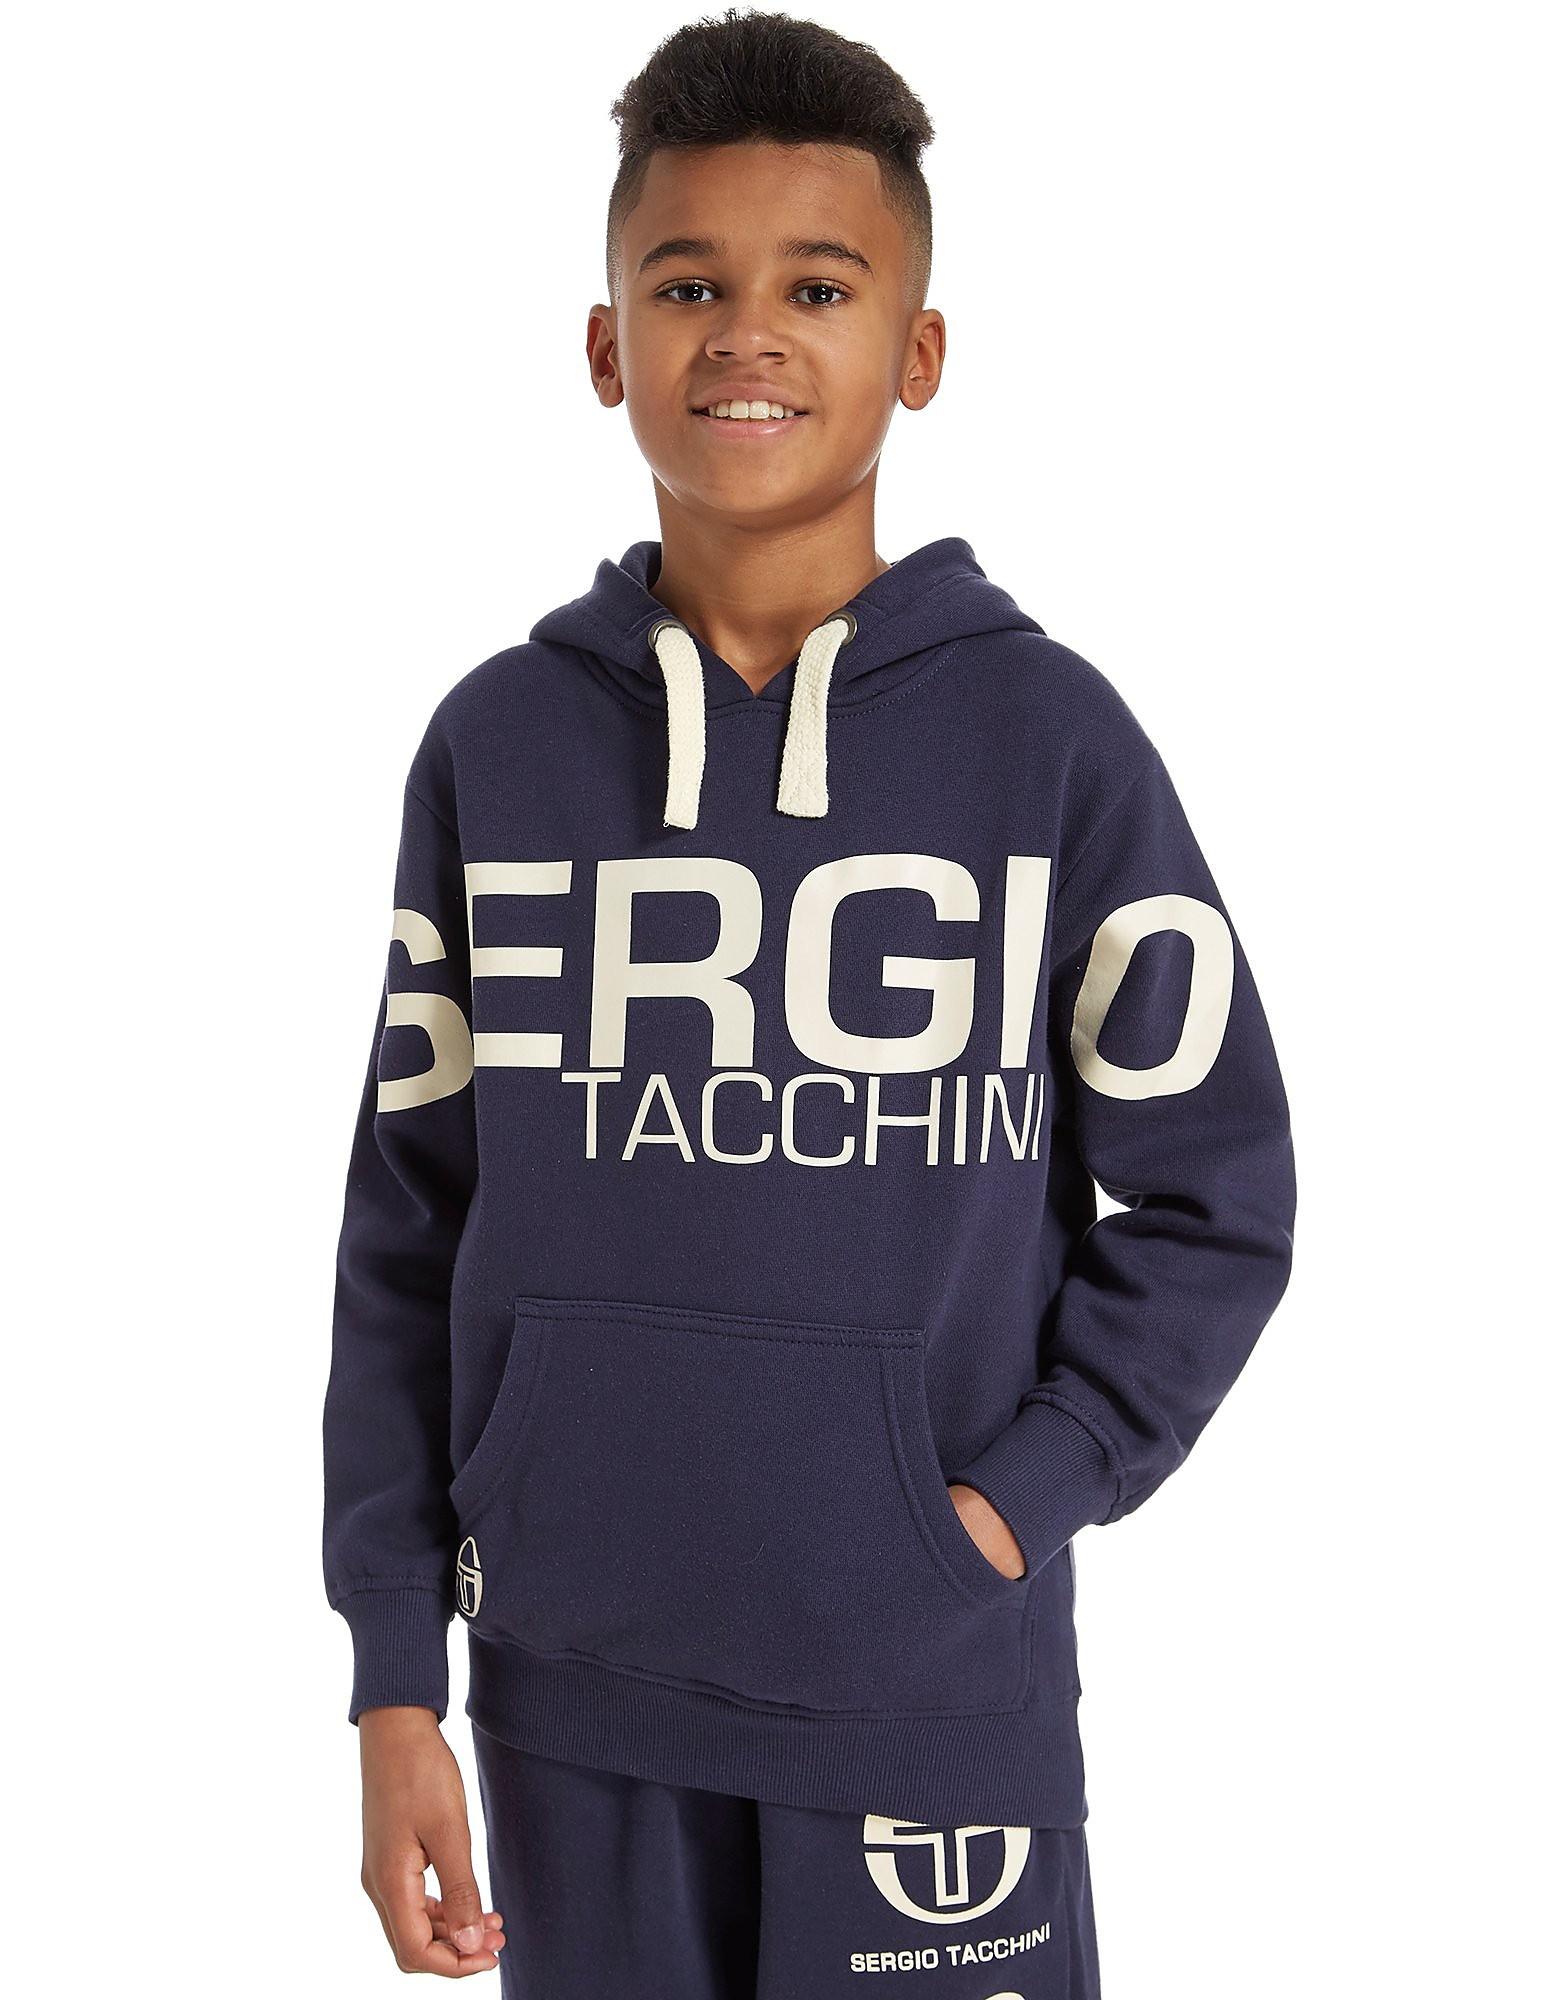 Sergio Tacchini Falcone Hoody Junior